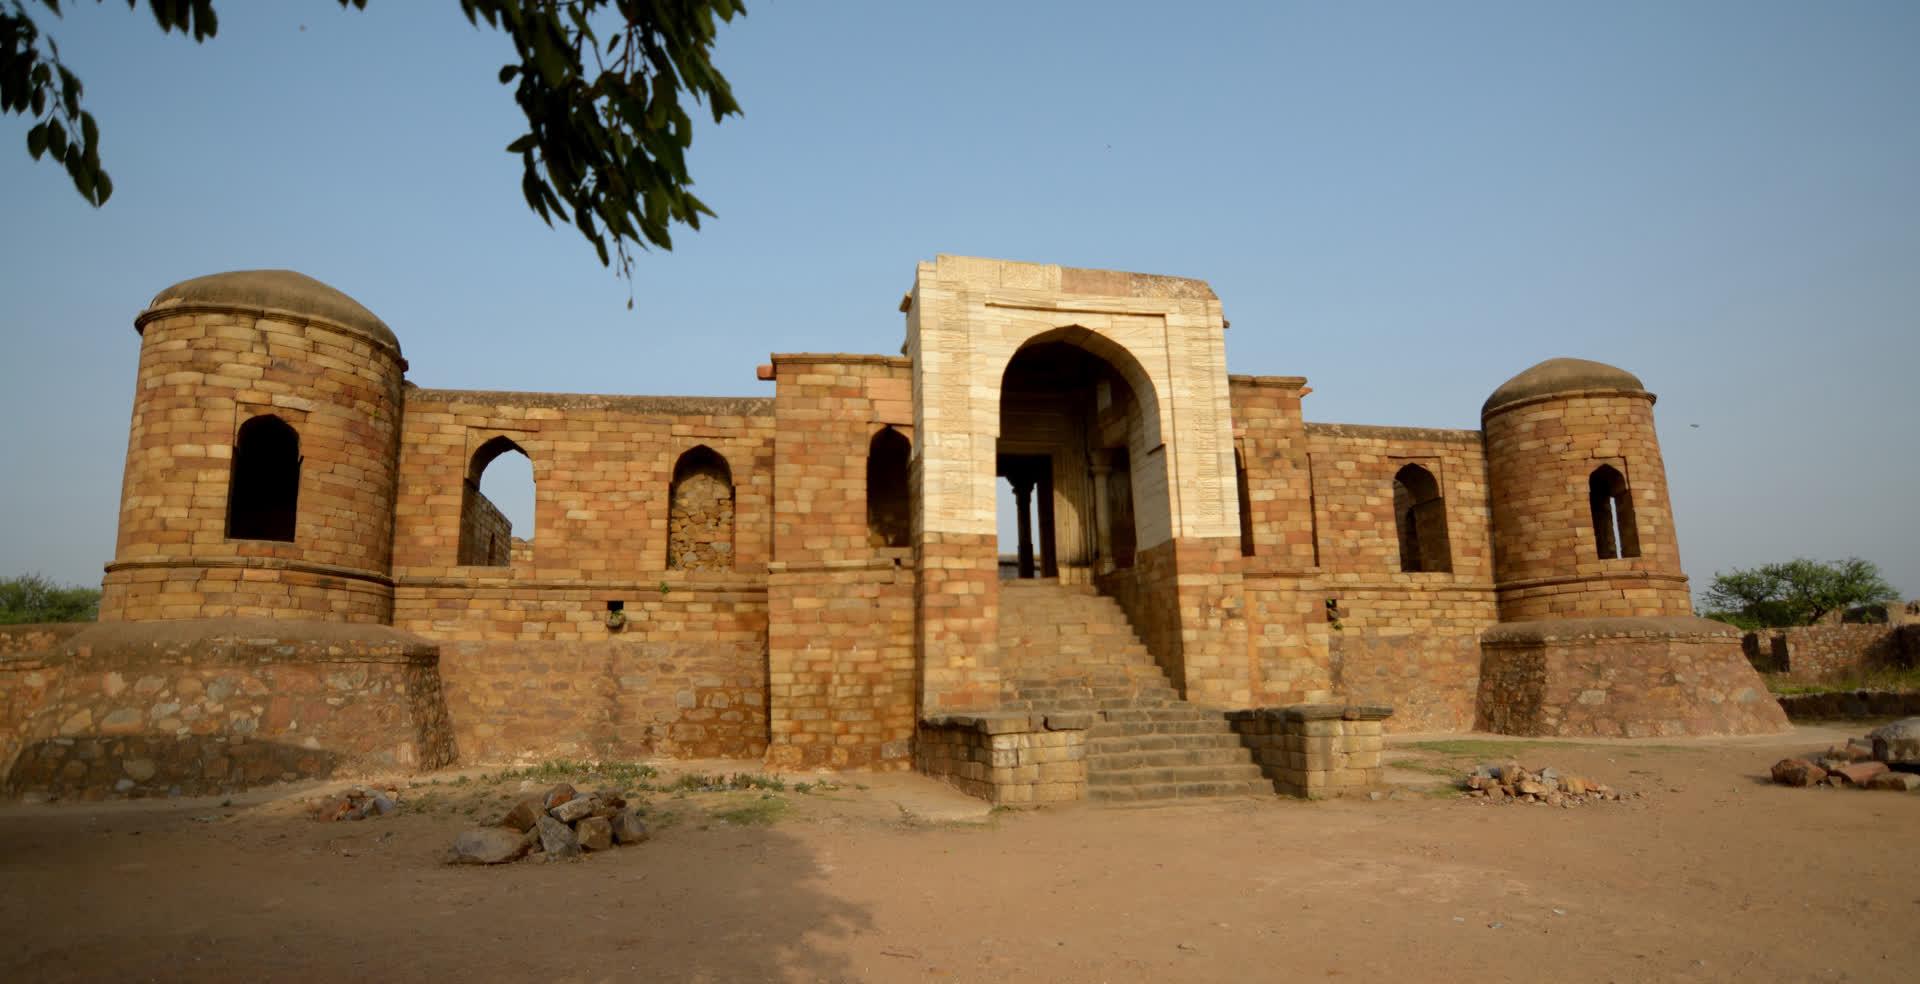 Sultan Ghari: India's Oldest Islamic Tomb